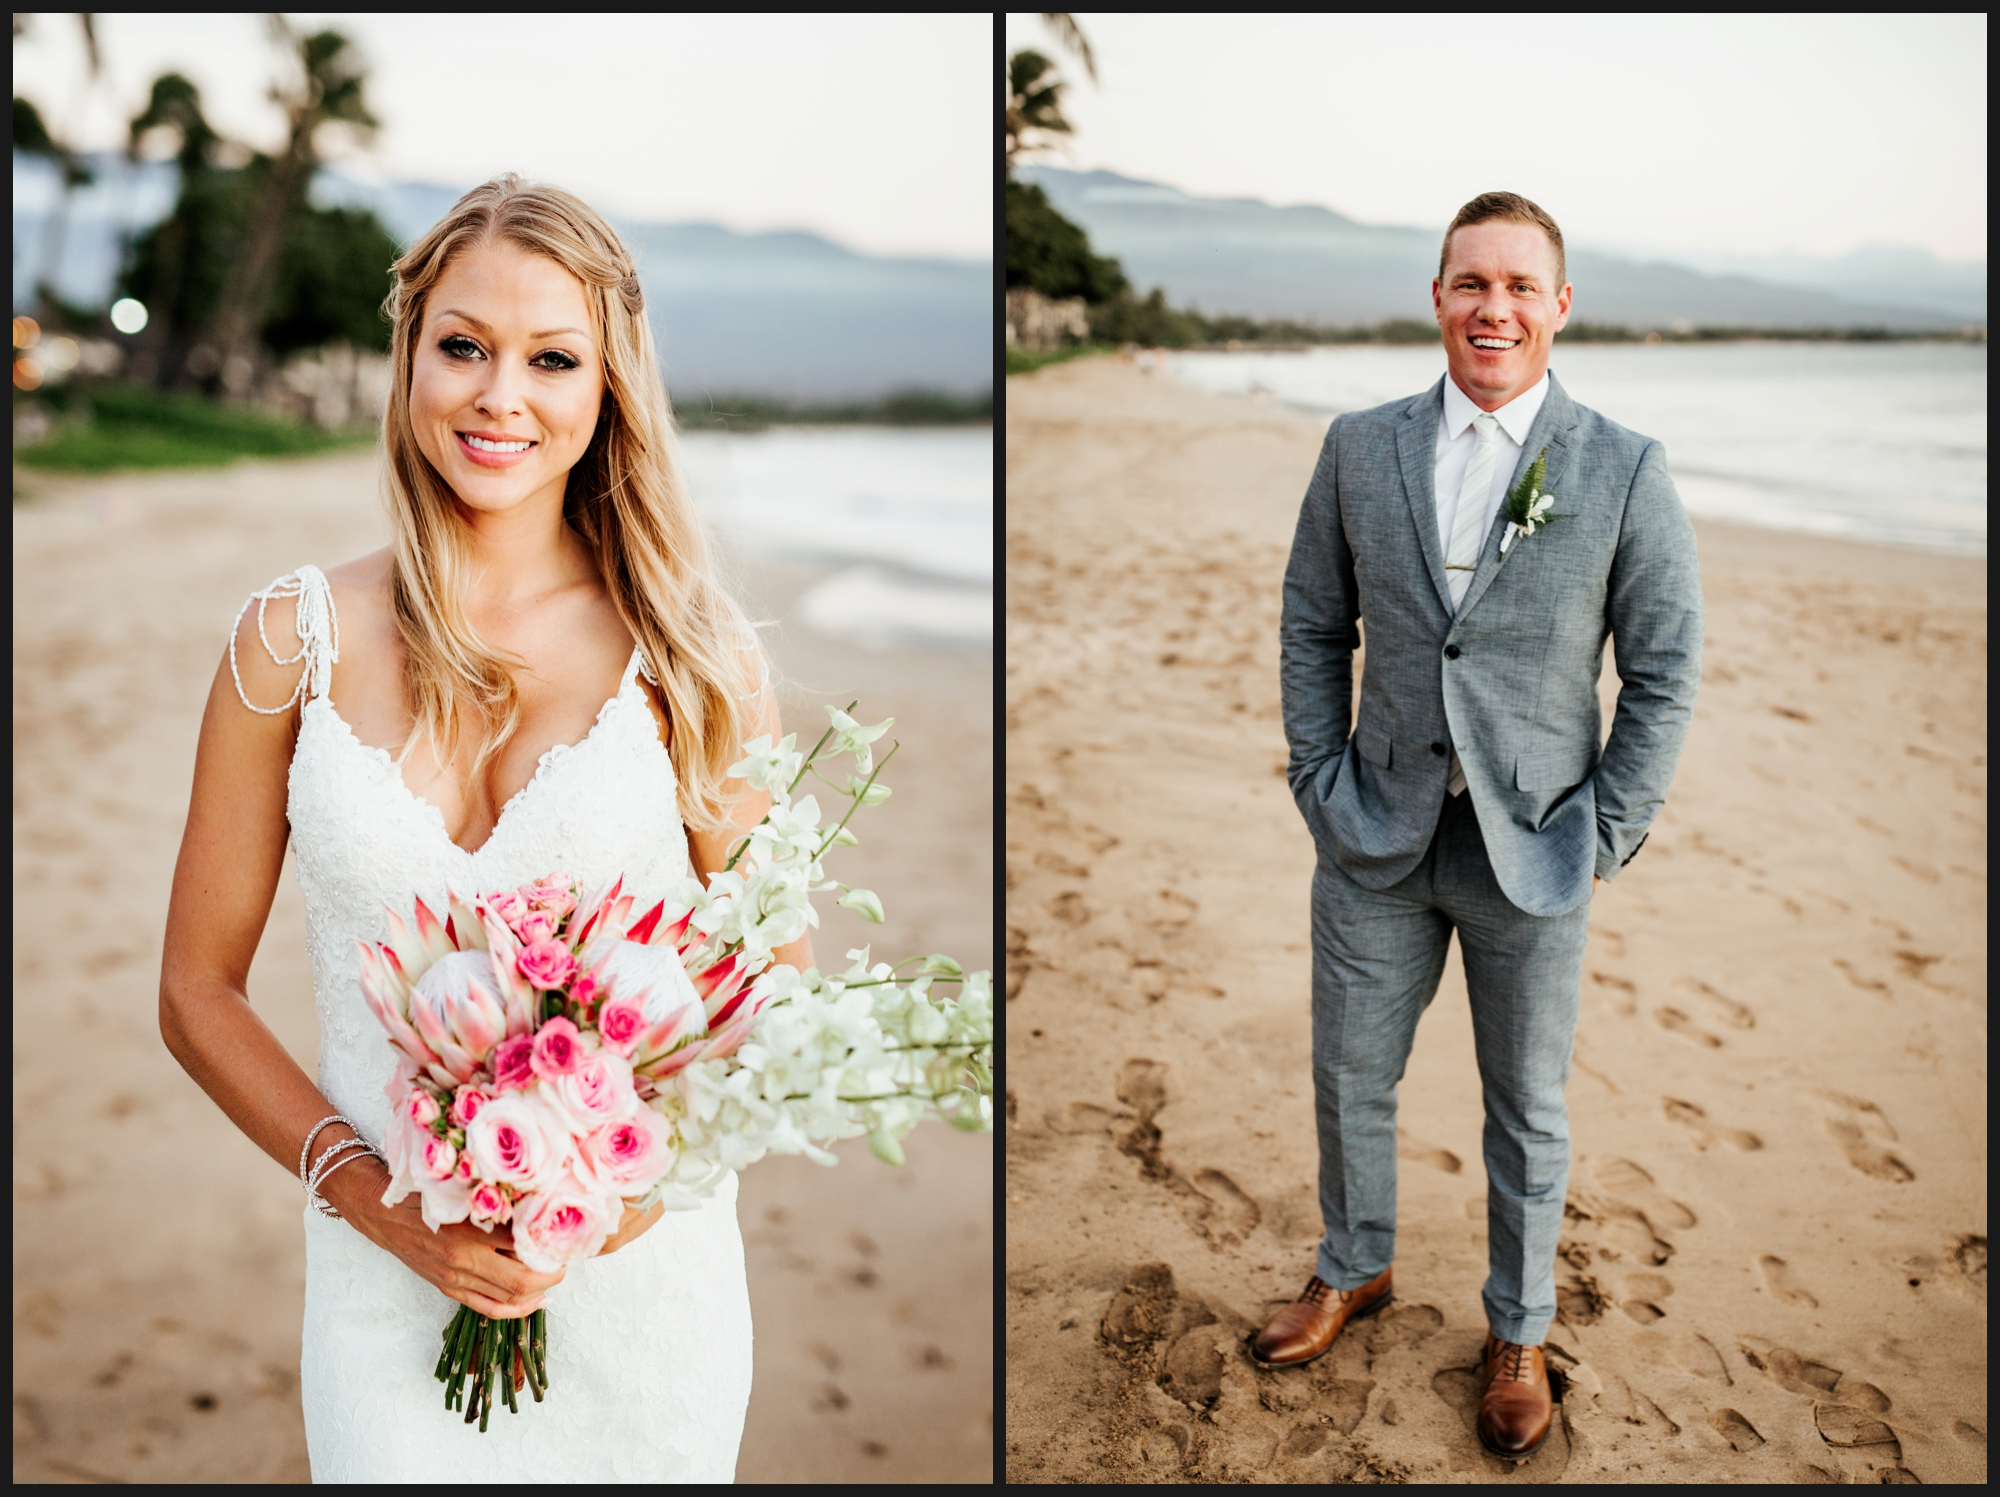 Orlando-Wedding-Photographer-destination-wedding-photographer-florida-wedding-photographer-hawaii-wedding-photographer_0018.jpg